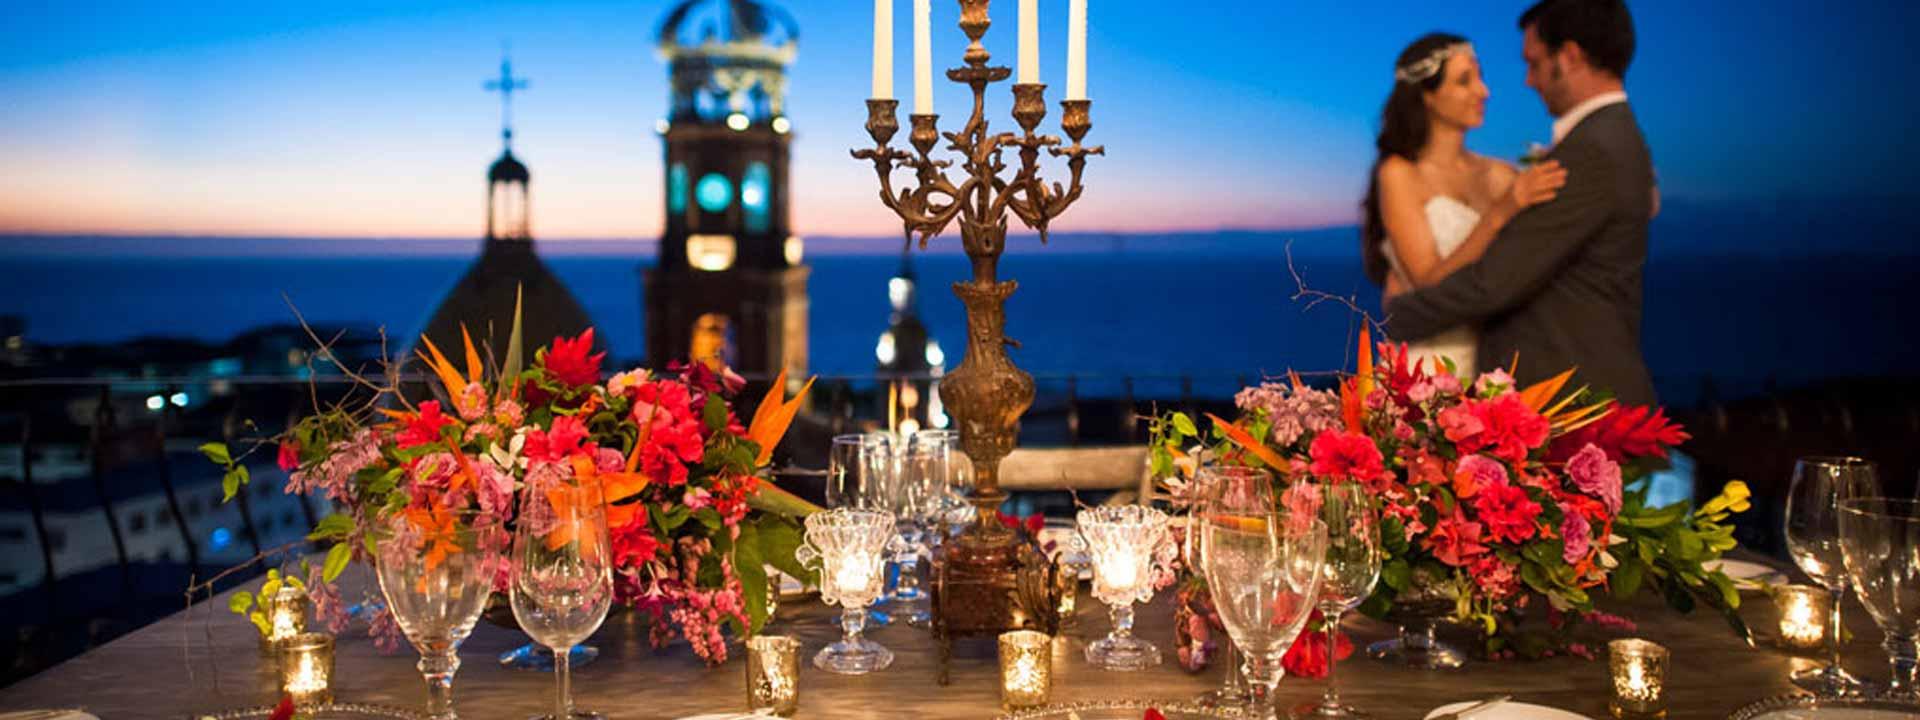 puerto-vallarta-weddings Wedding Planner